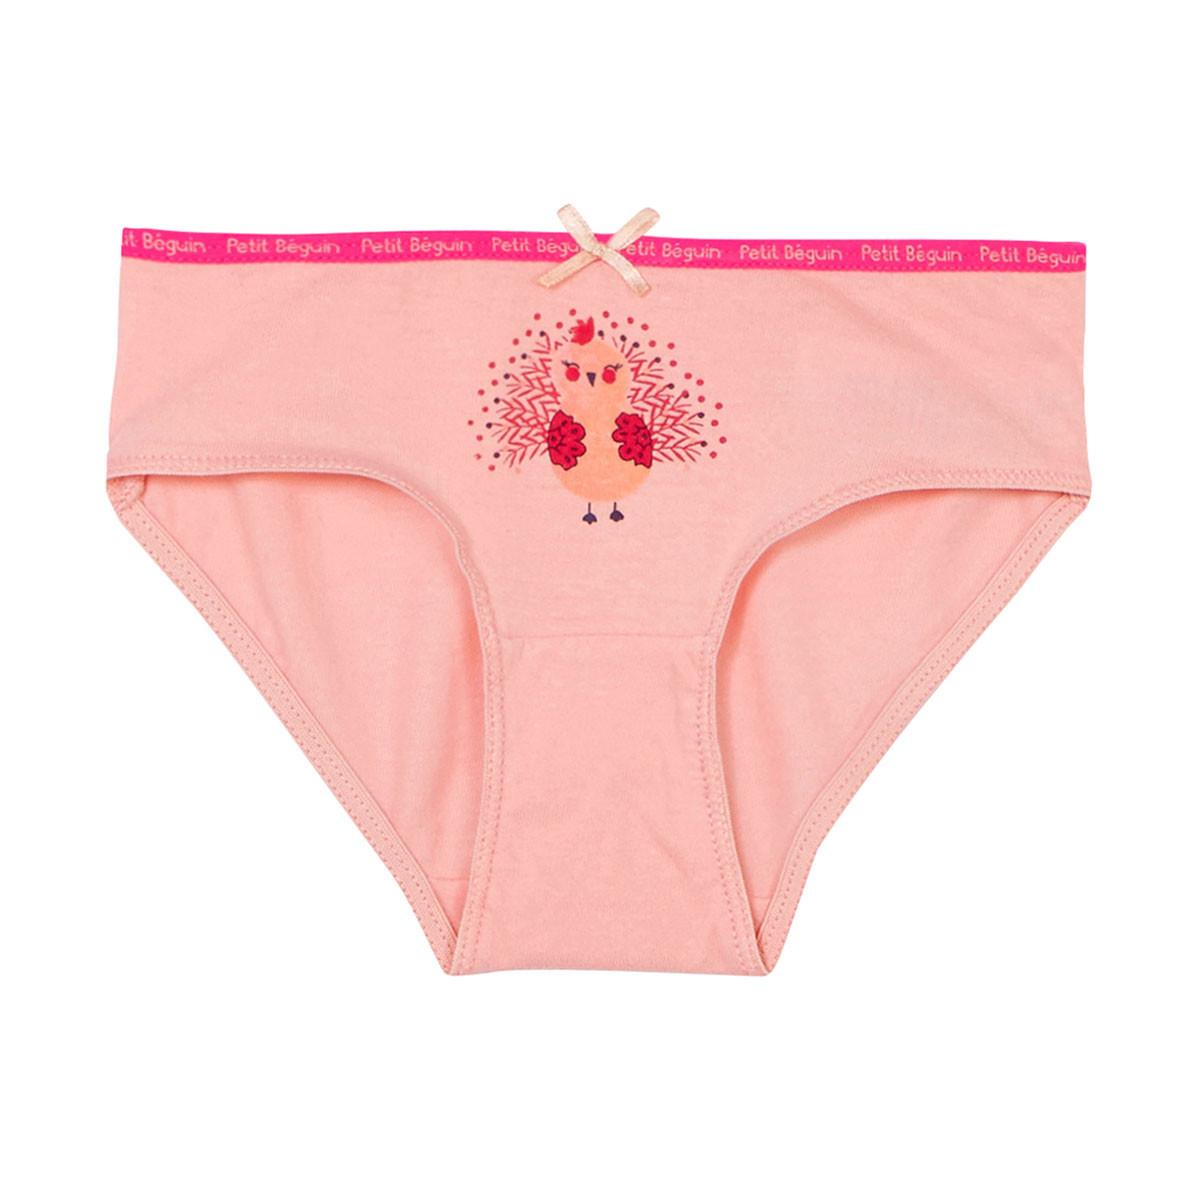 Lot de 3 culottes fille Brazilia rose